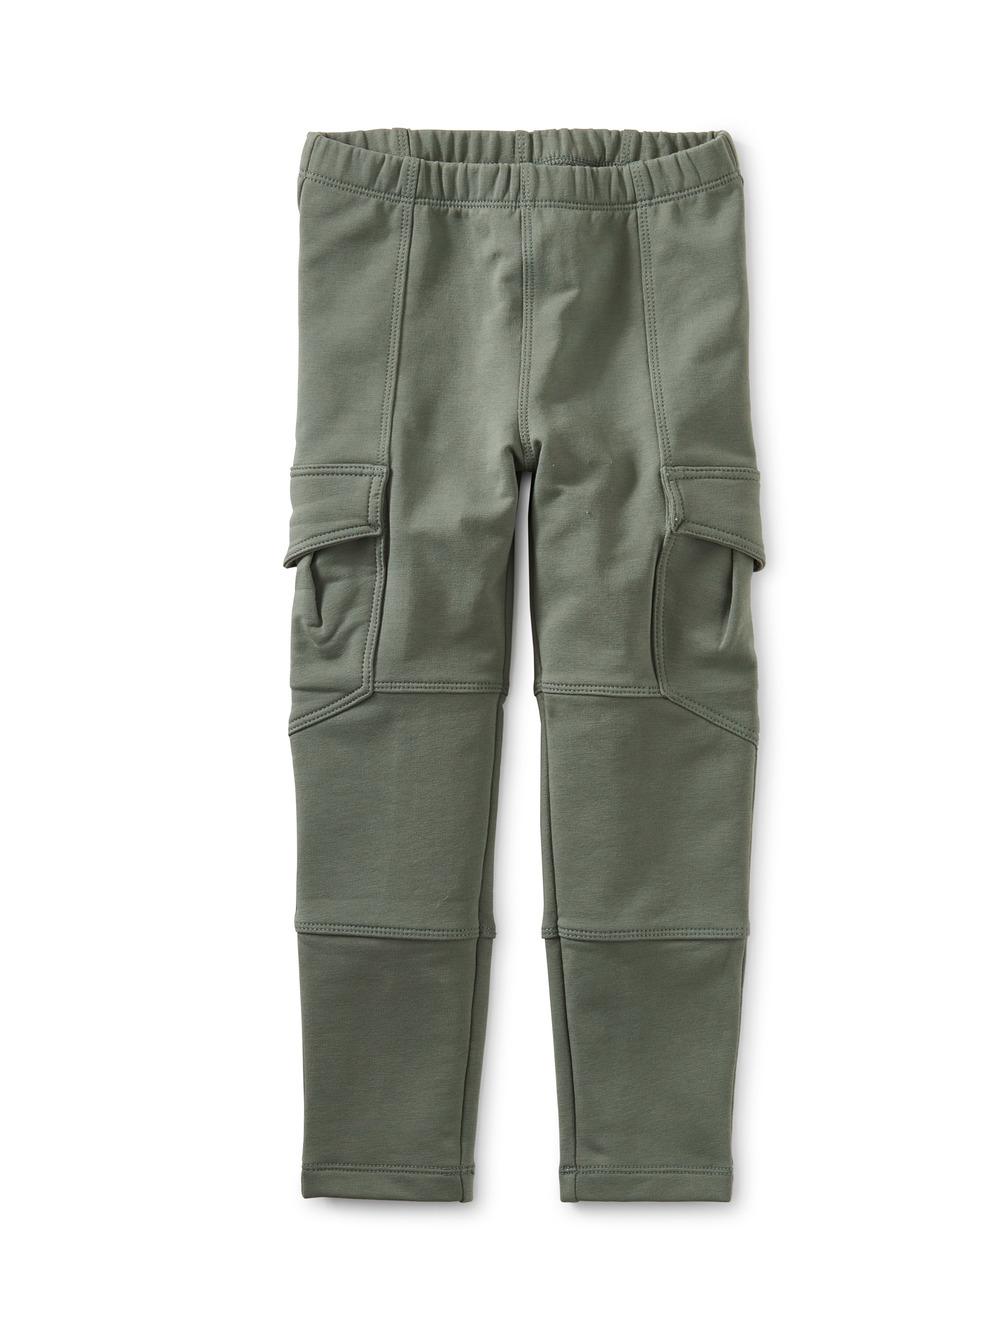 Stretch Cargo Pants